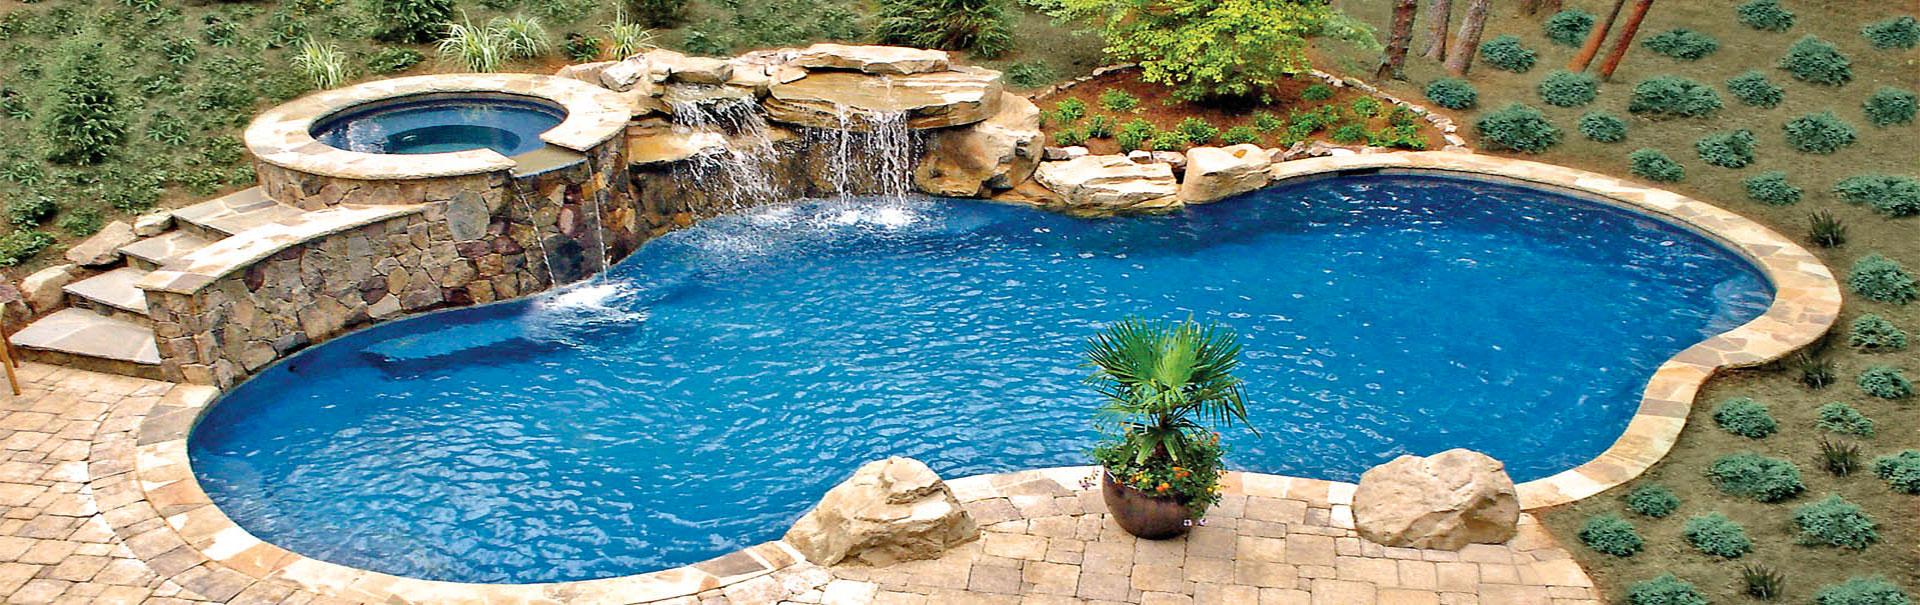 Charlotte Custom Swimming Pool Builders│blue Haven Pools